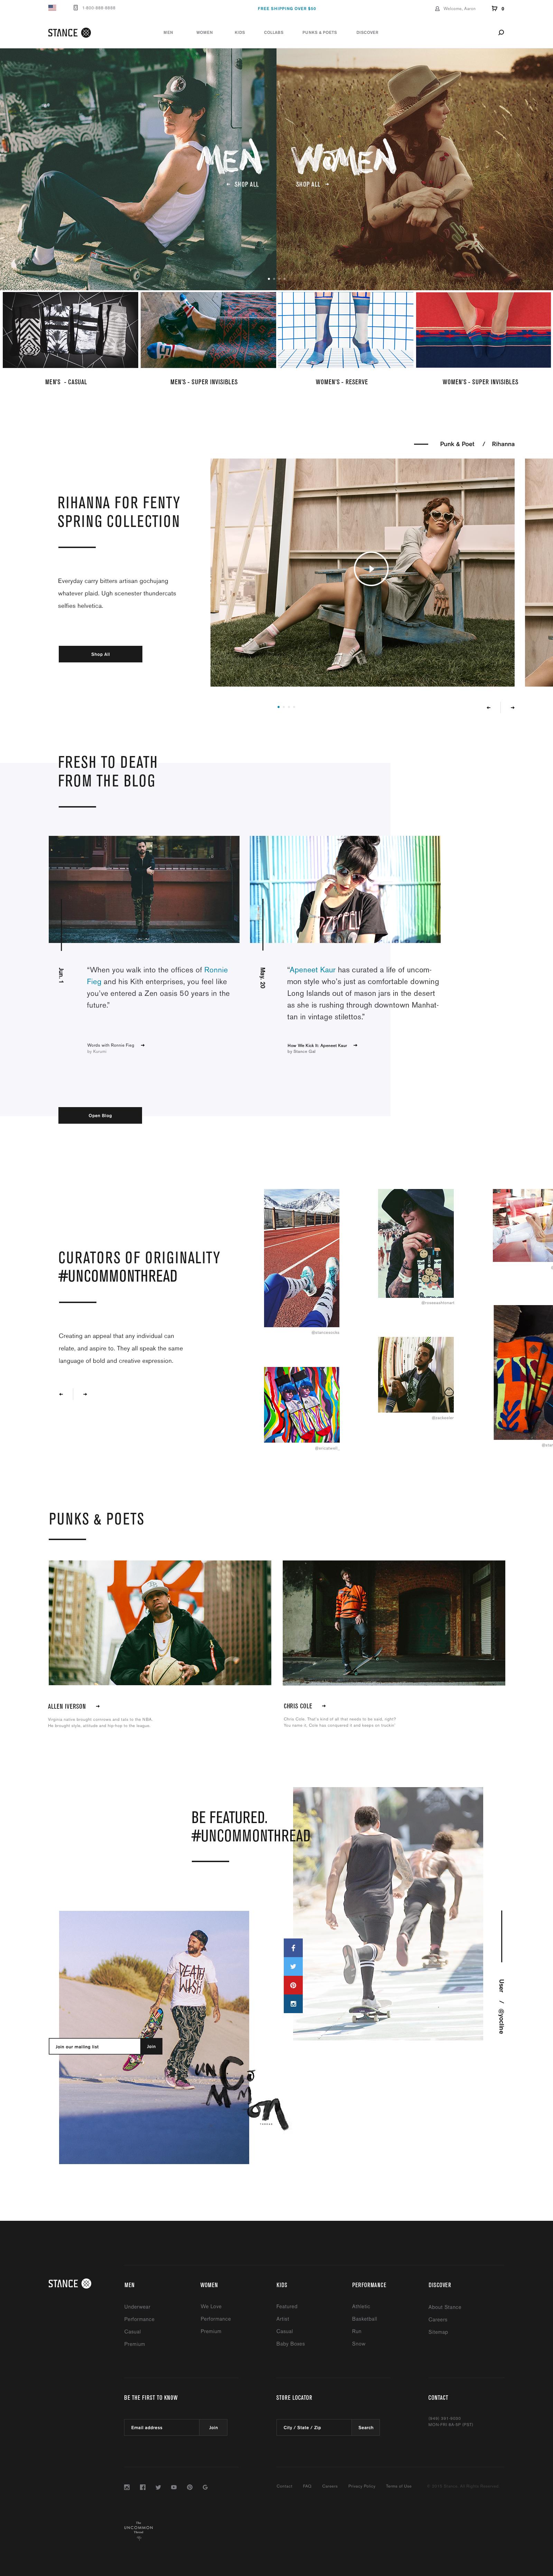 Stance homepage 1320 desktop